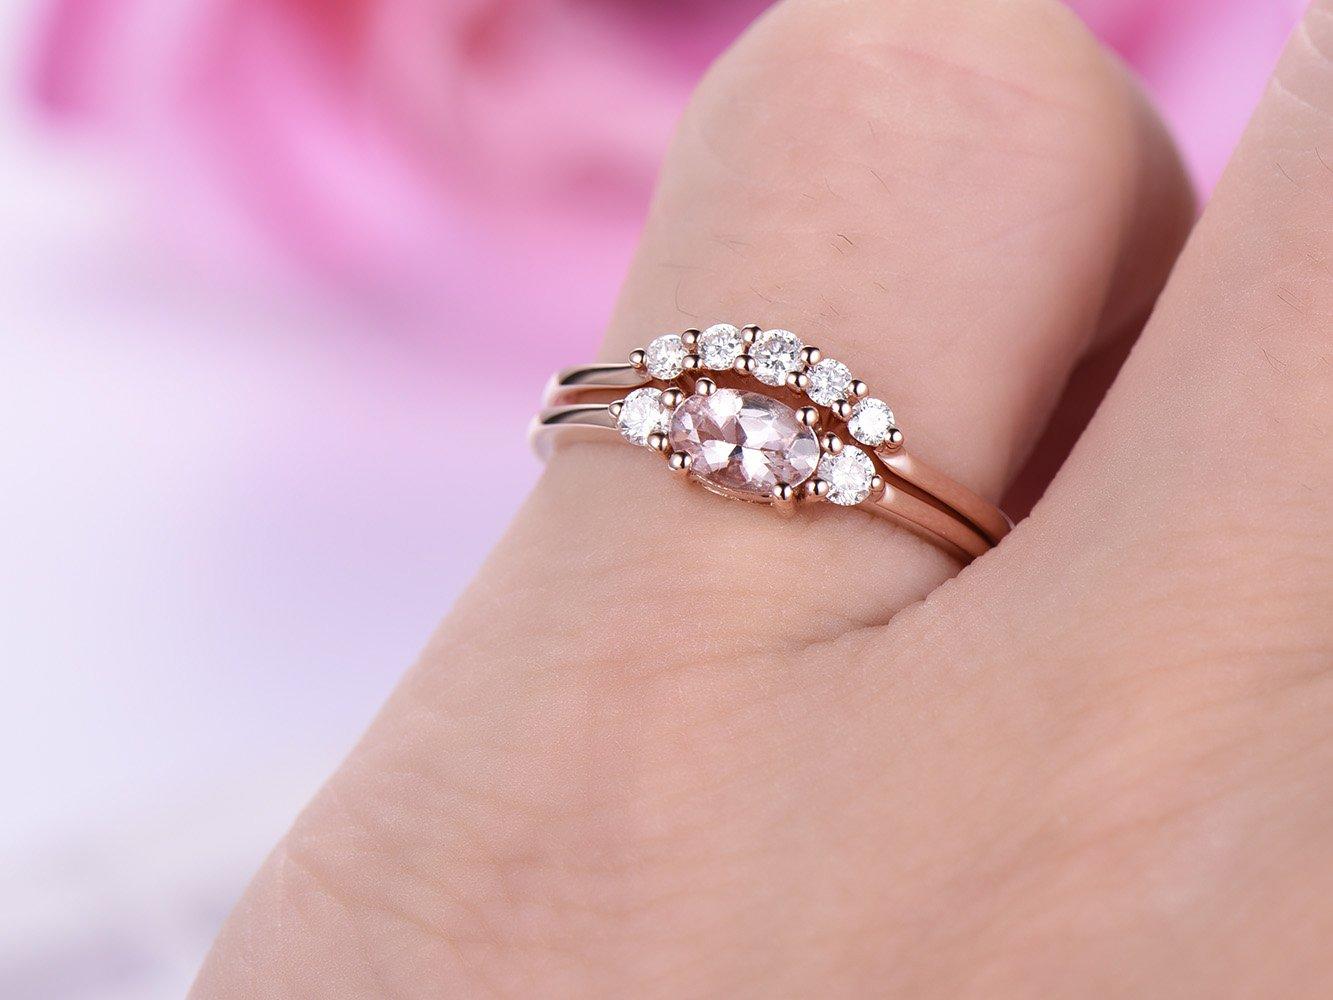 Amazon.com: Oval Morganite Engagement Ring Sets Pave Diamond Wedding ...